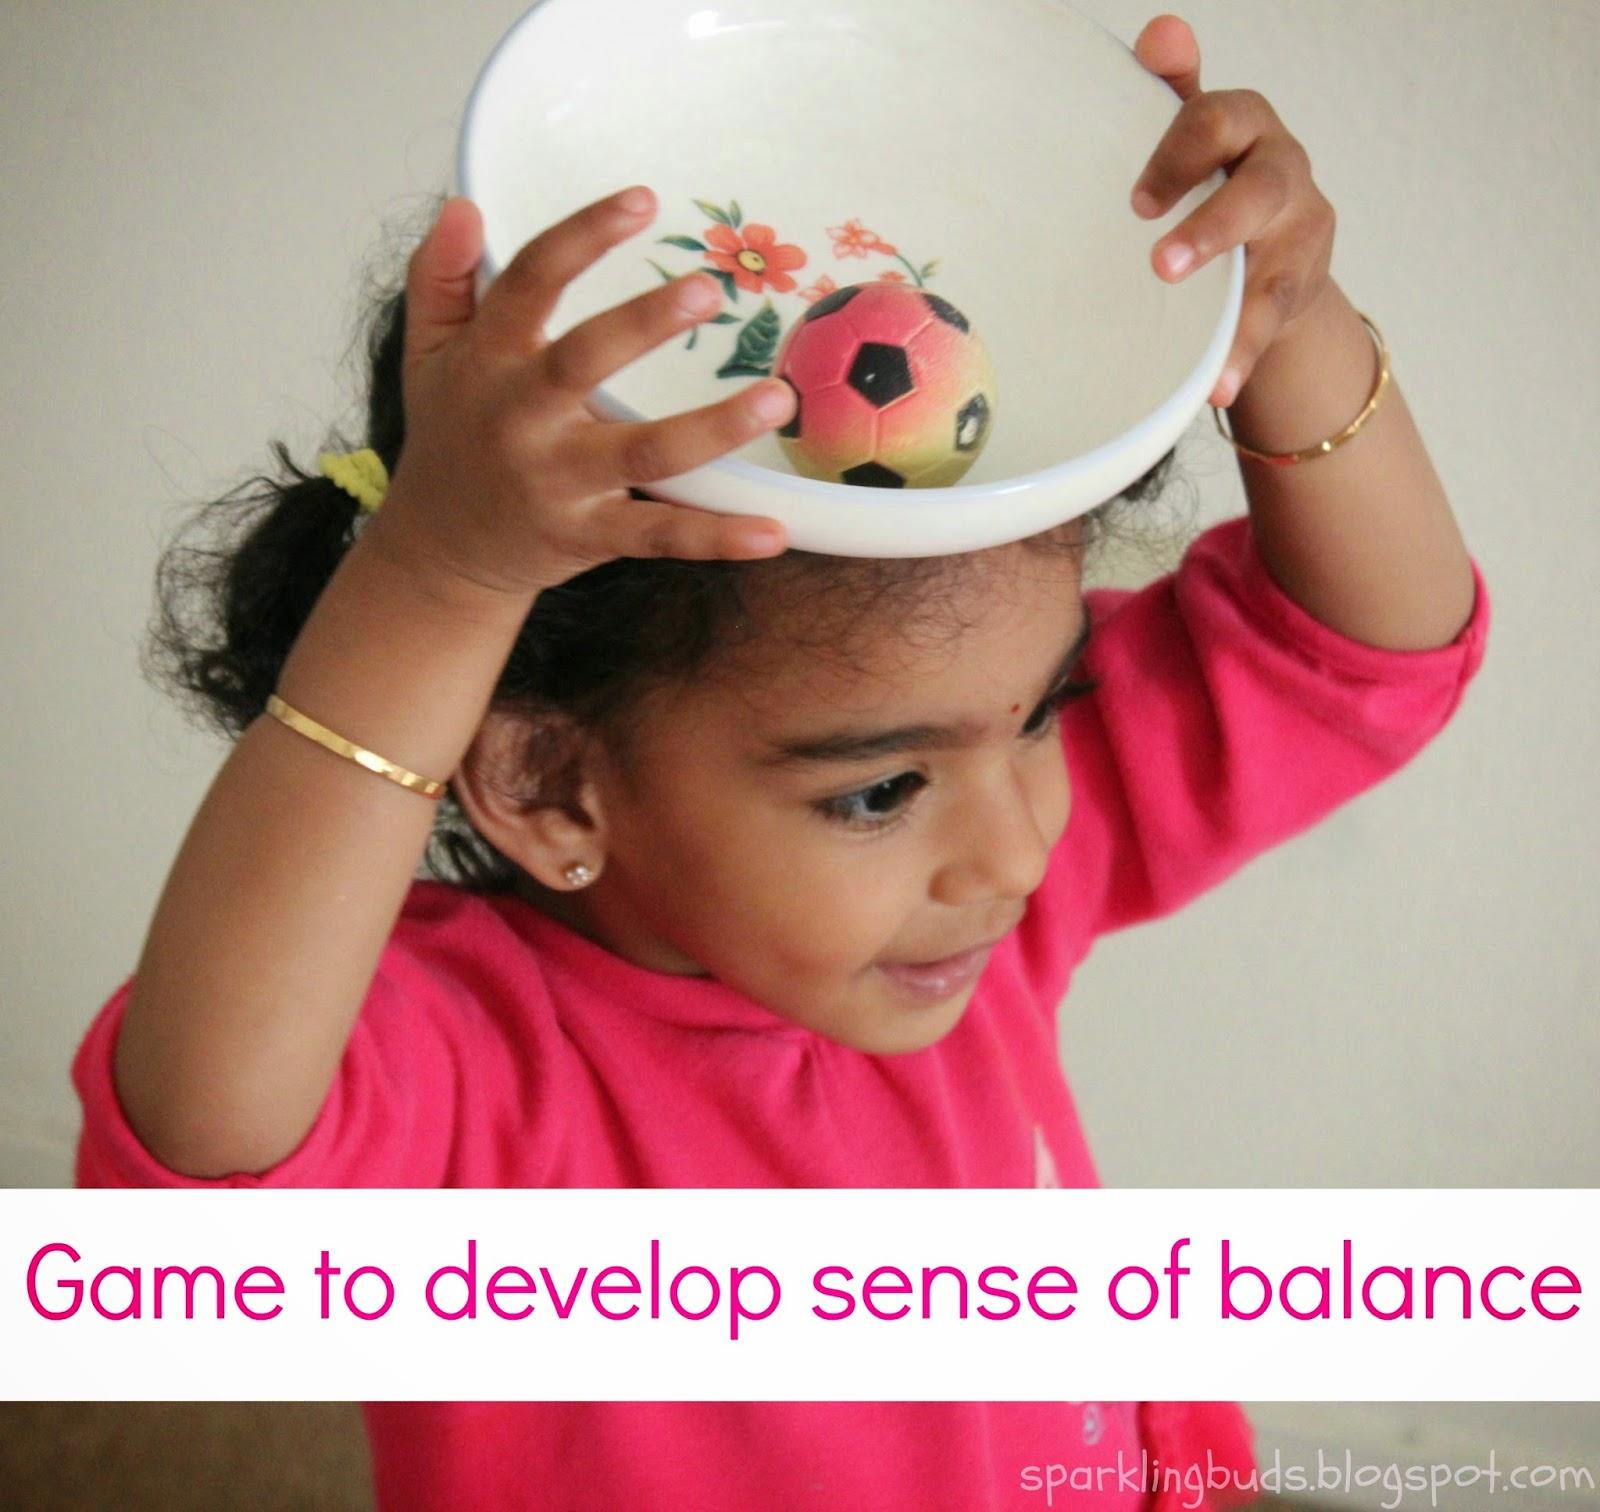 Ball Balance Season Java Game: A Simple Game To Develop Sense Of Balance